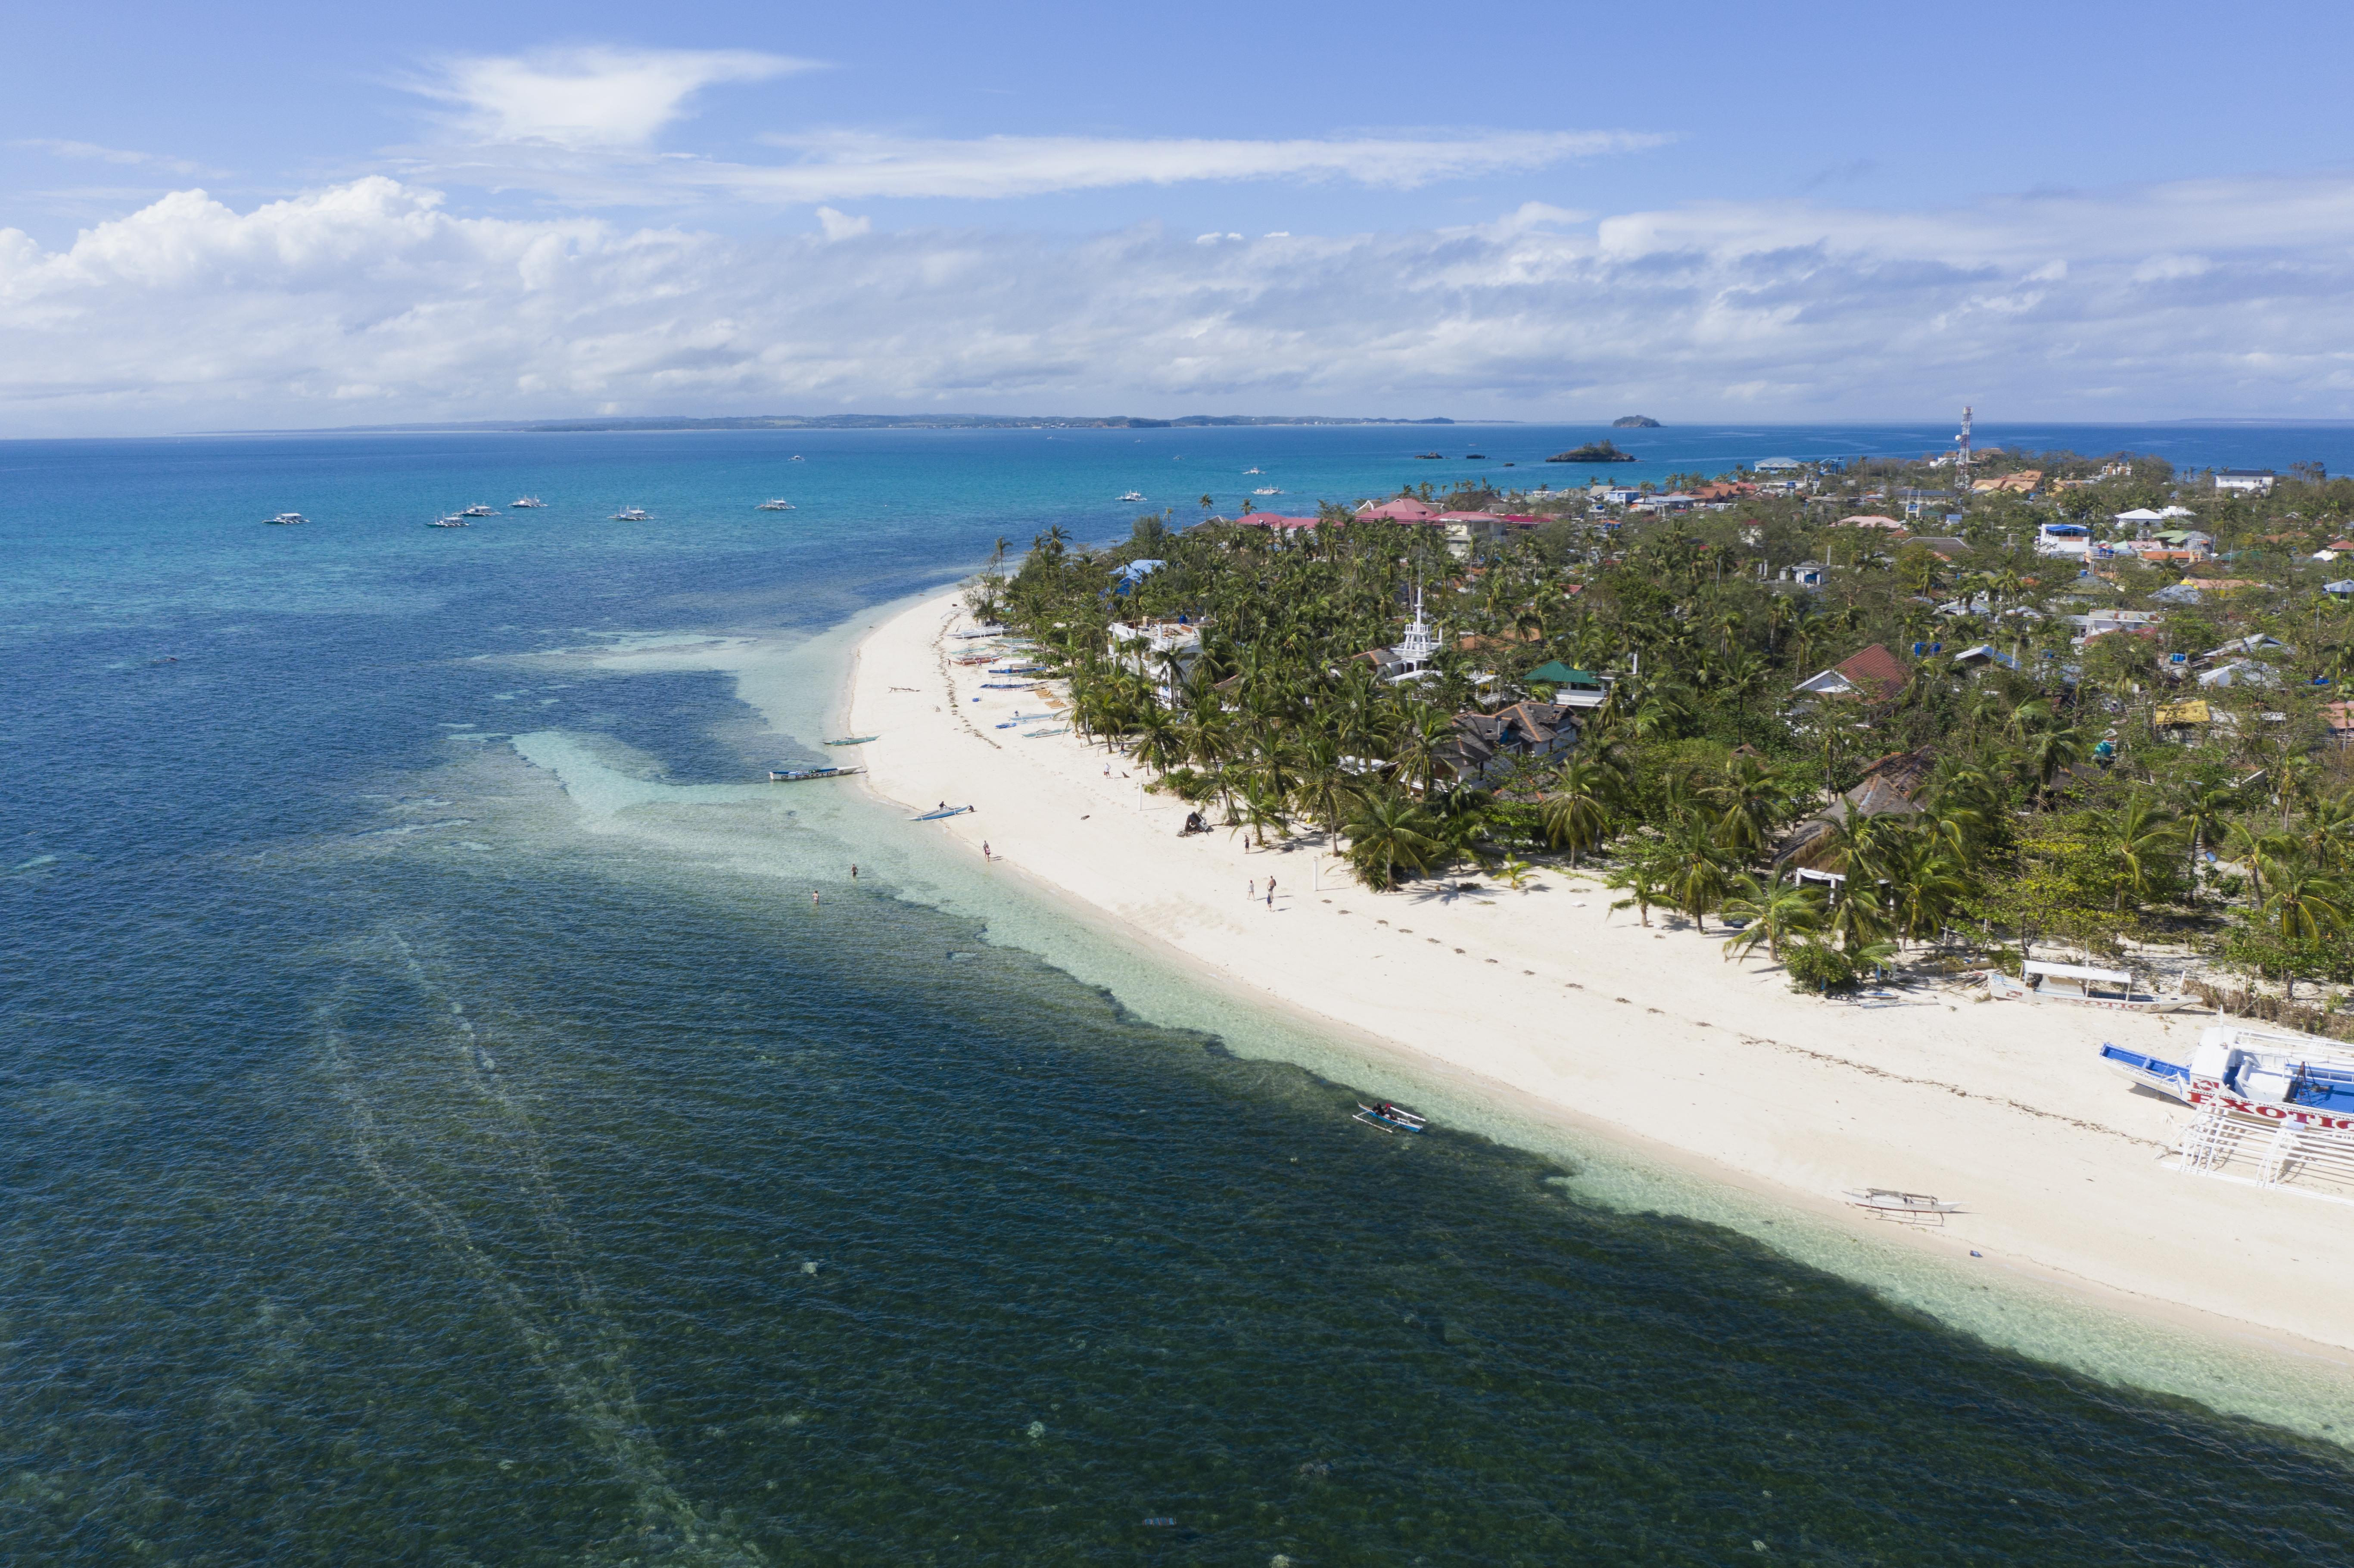 Malapascua looking south